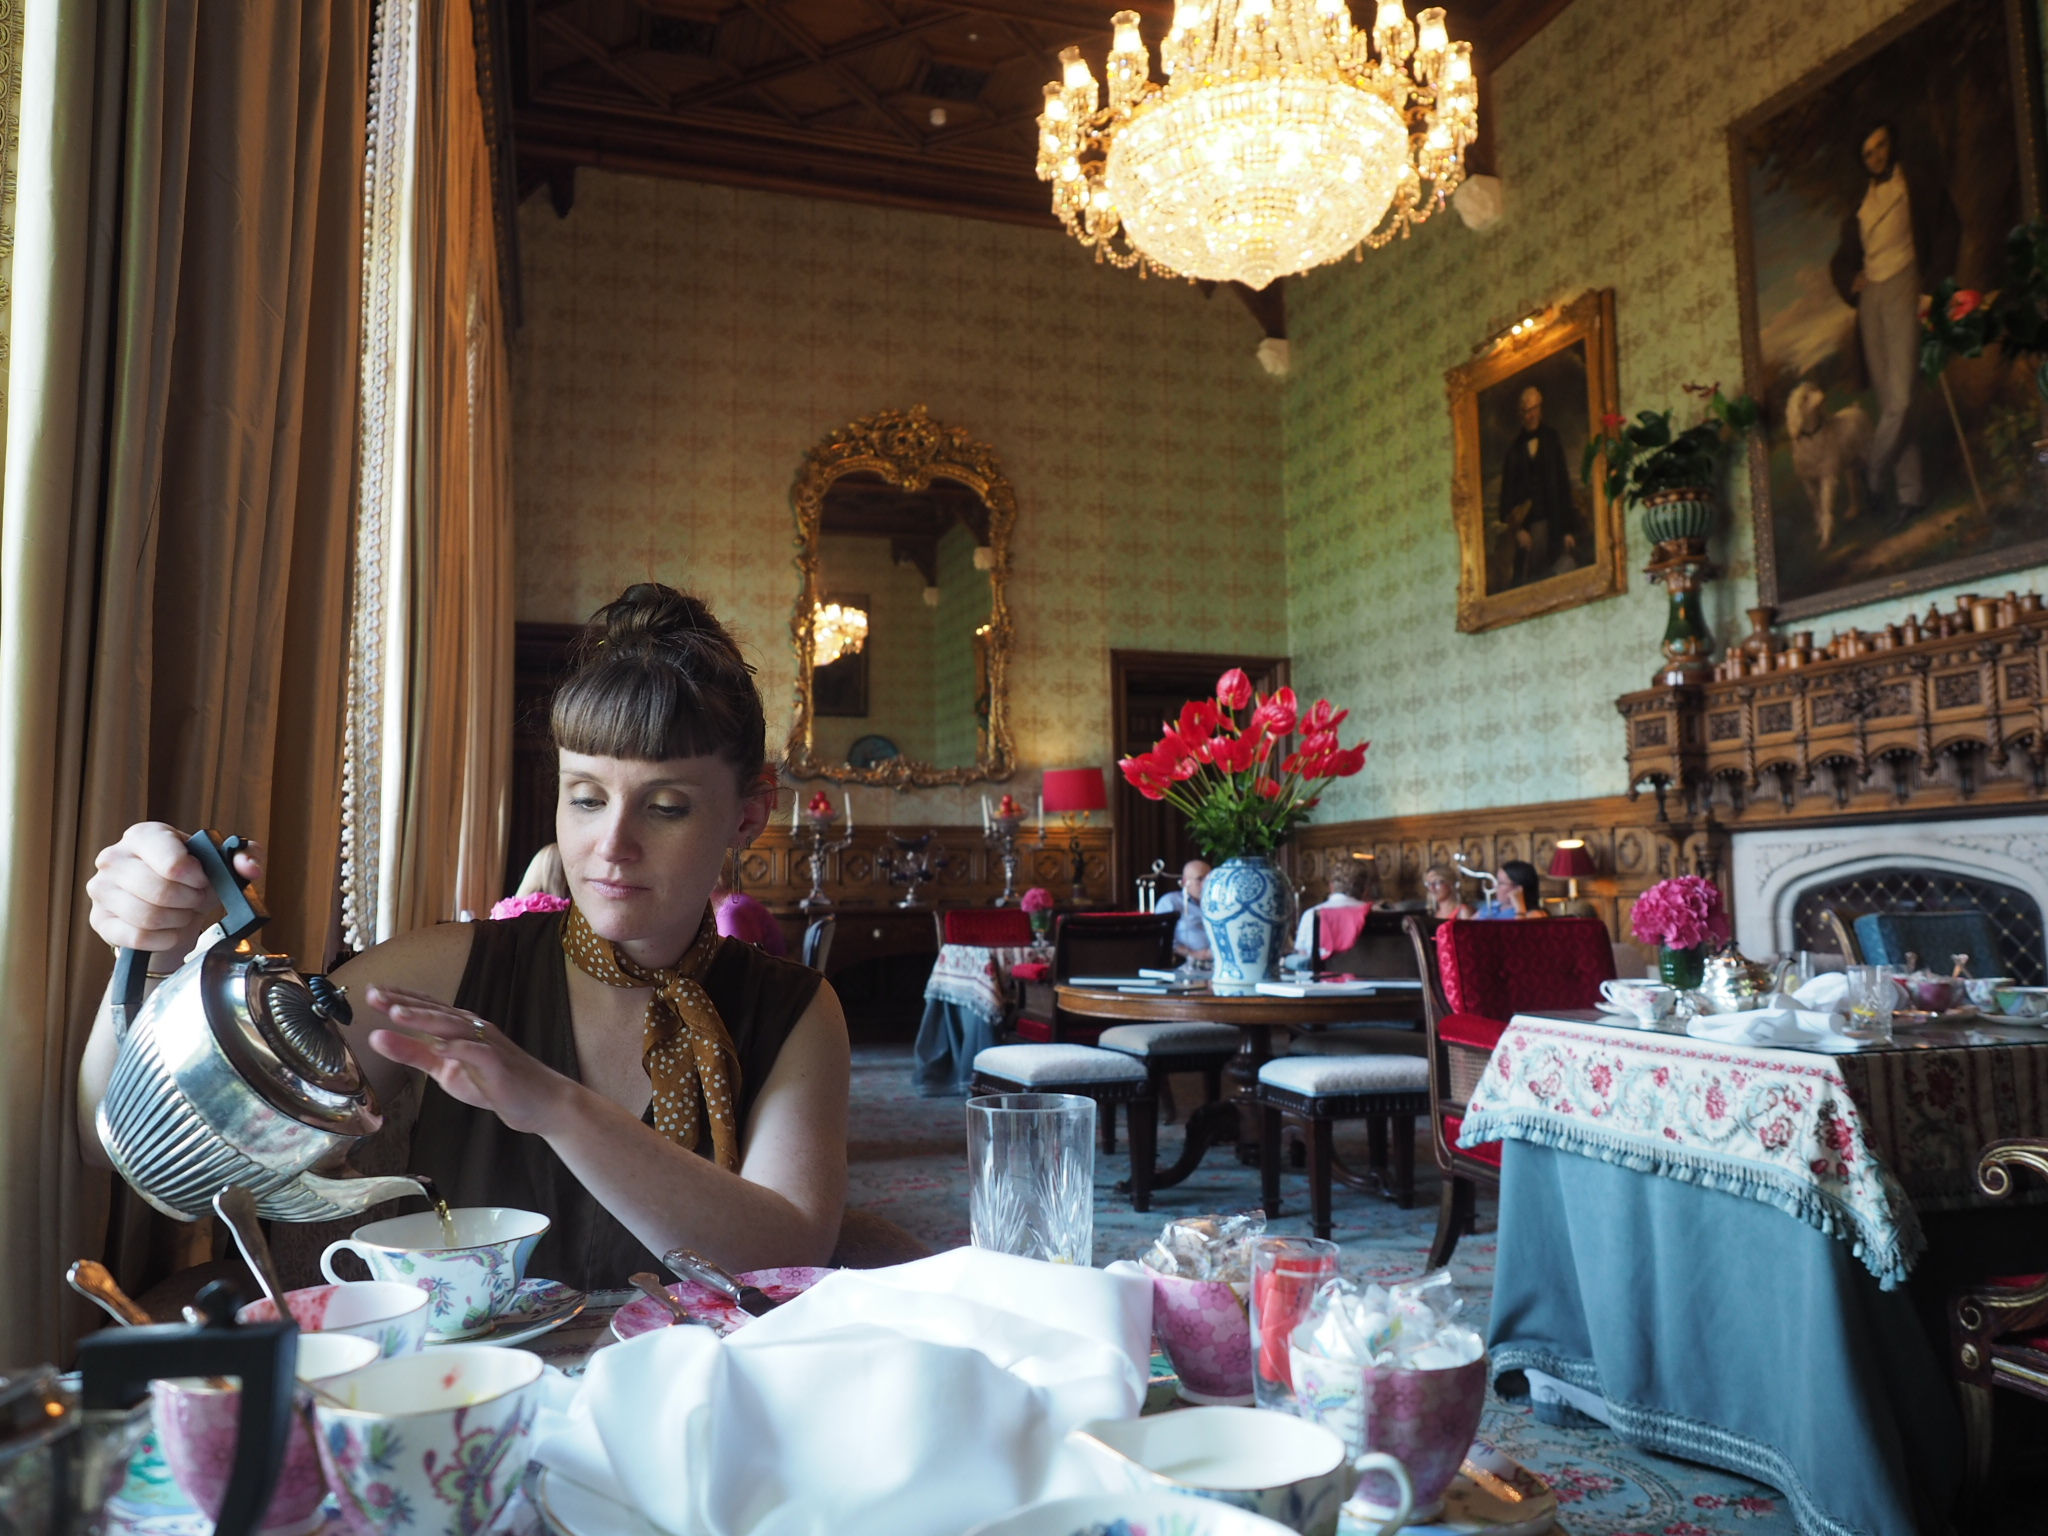 Afternoon Tea at Ashford Castle